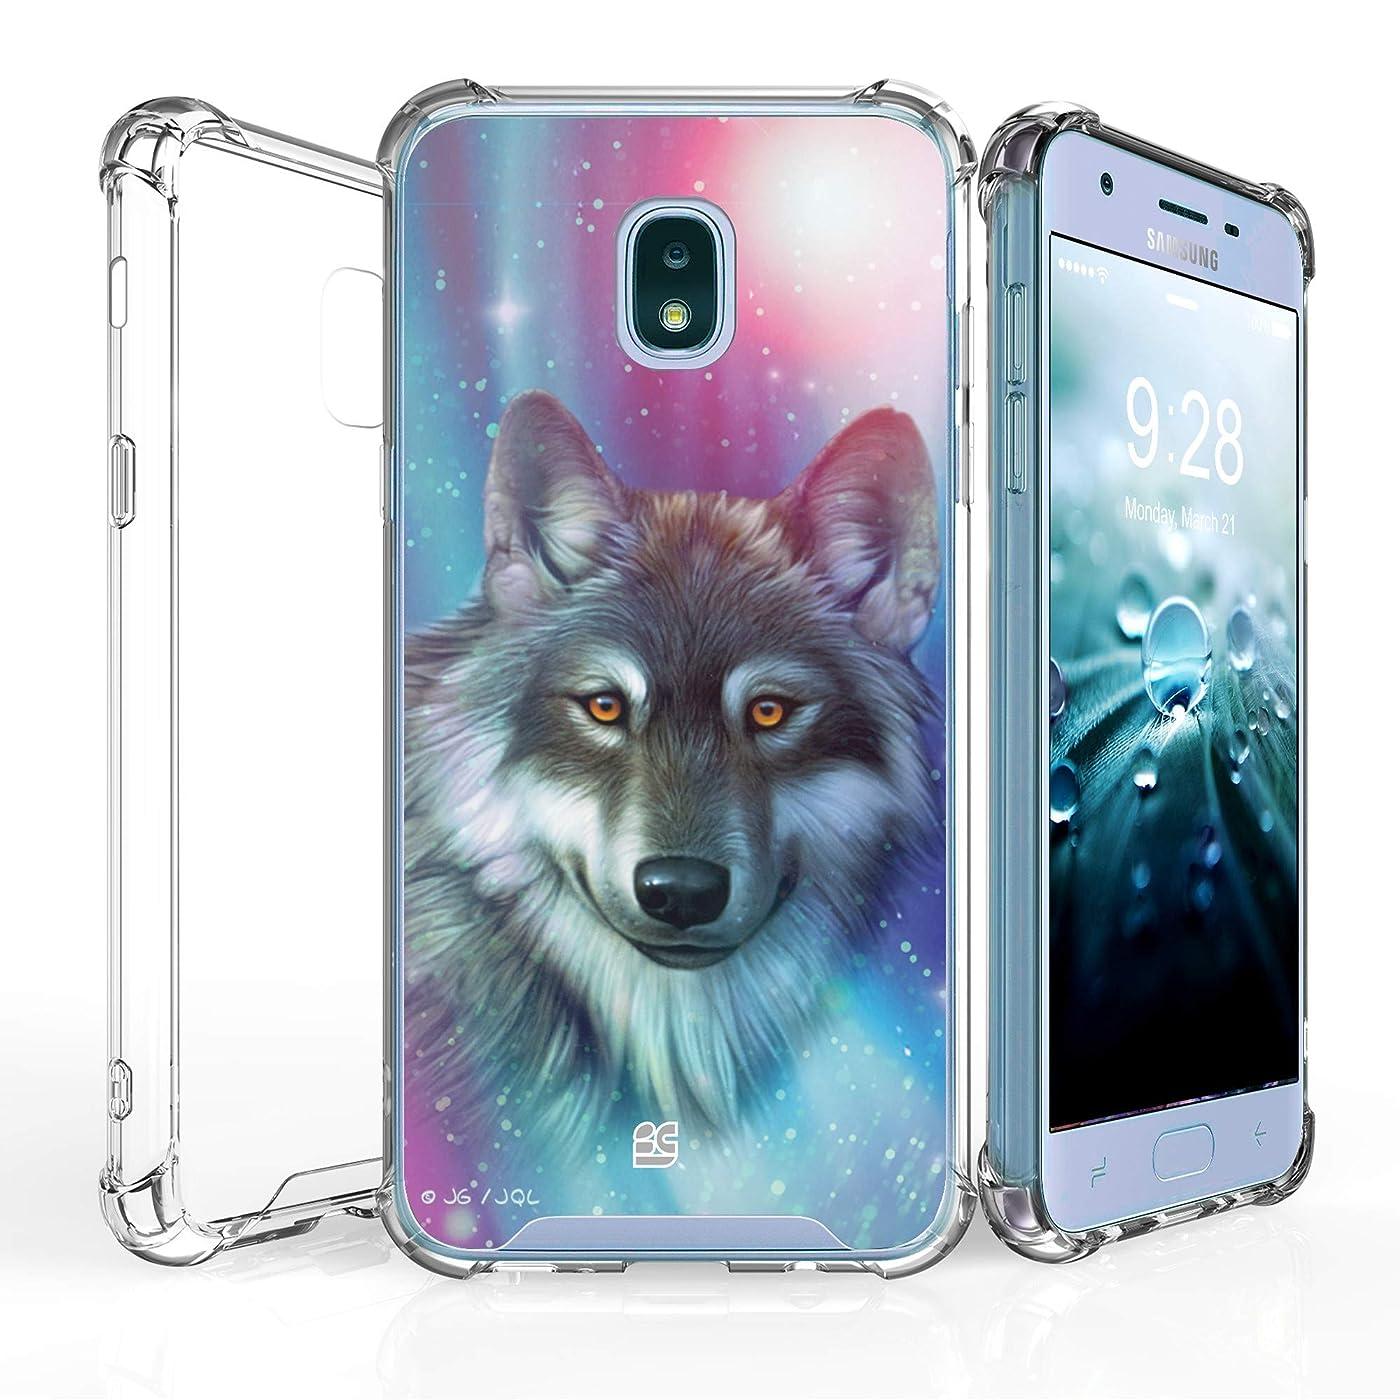 for Samsung Galaxy J7 (2018), J7 Refine, J7 Star, J7V 2nd Gen, J737 [Shockproof] Hybrid Slim Cover w/[Air Pocket Corners] Case - Lone Wolf nrje800981694130